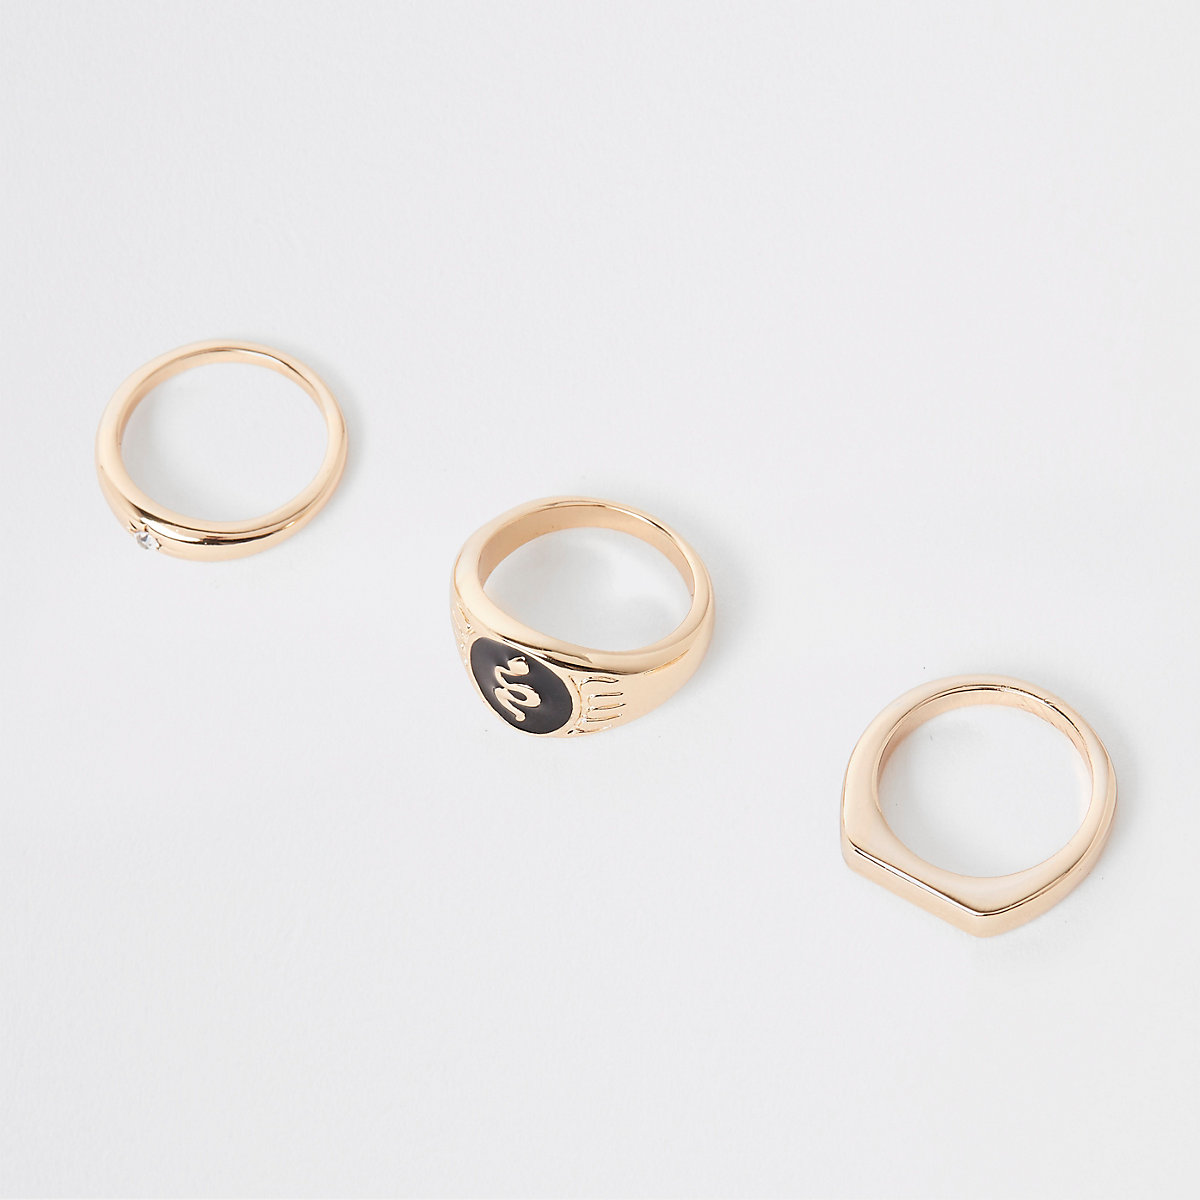 Gold tone enamel ring pack